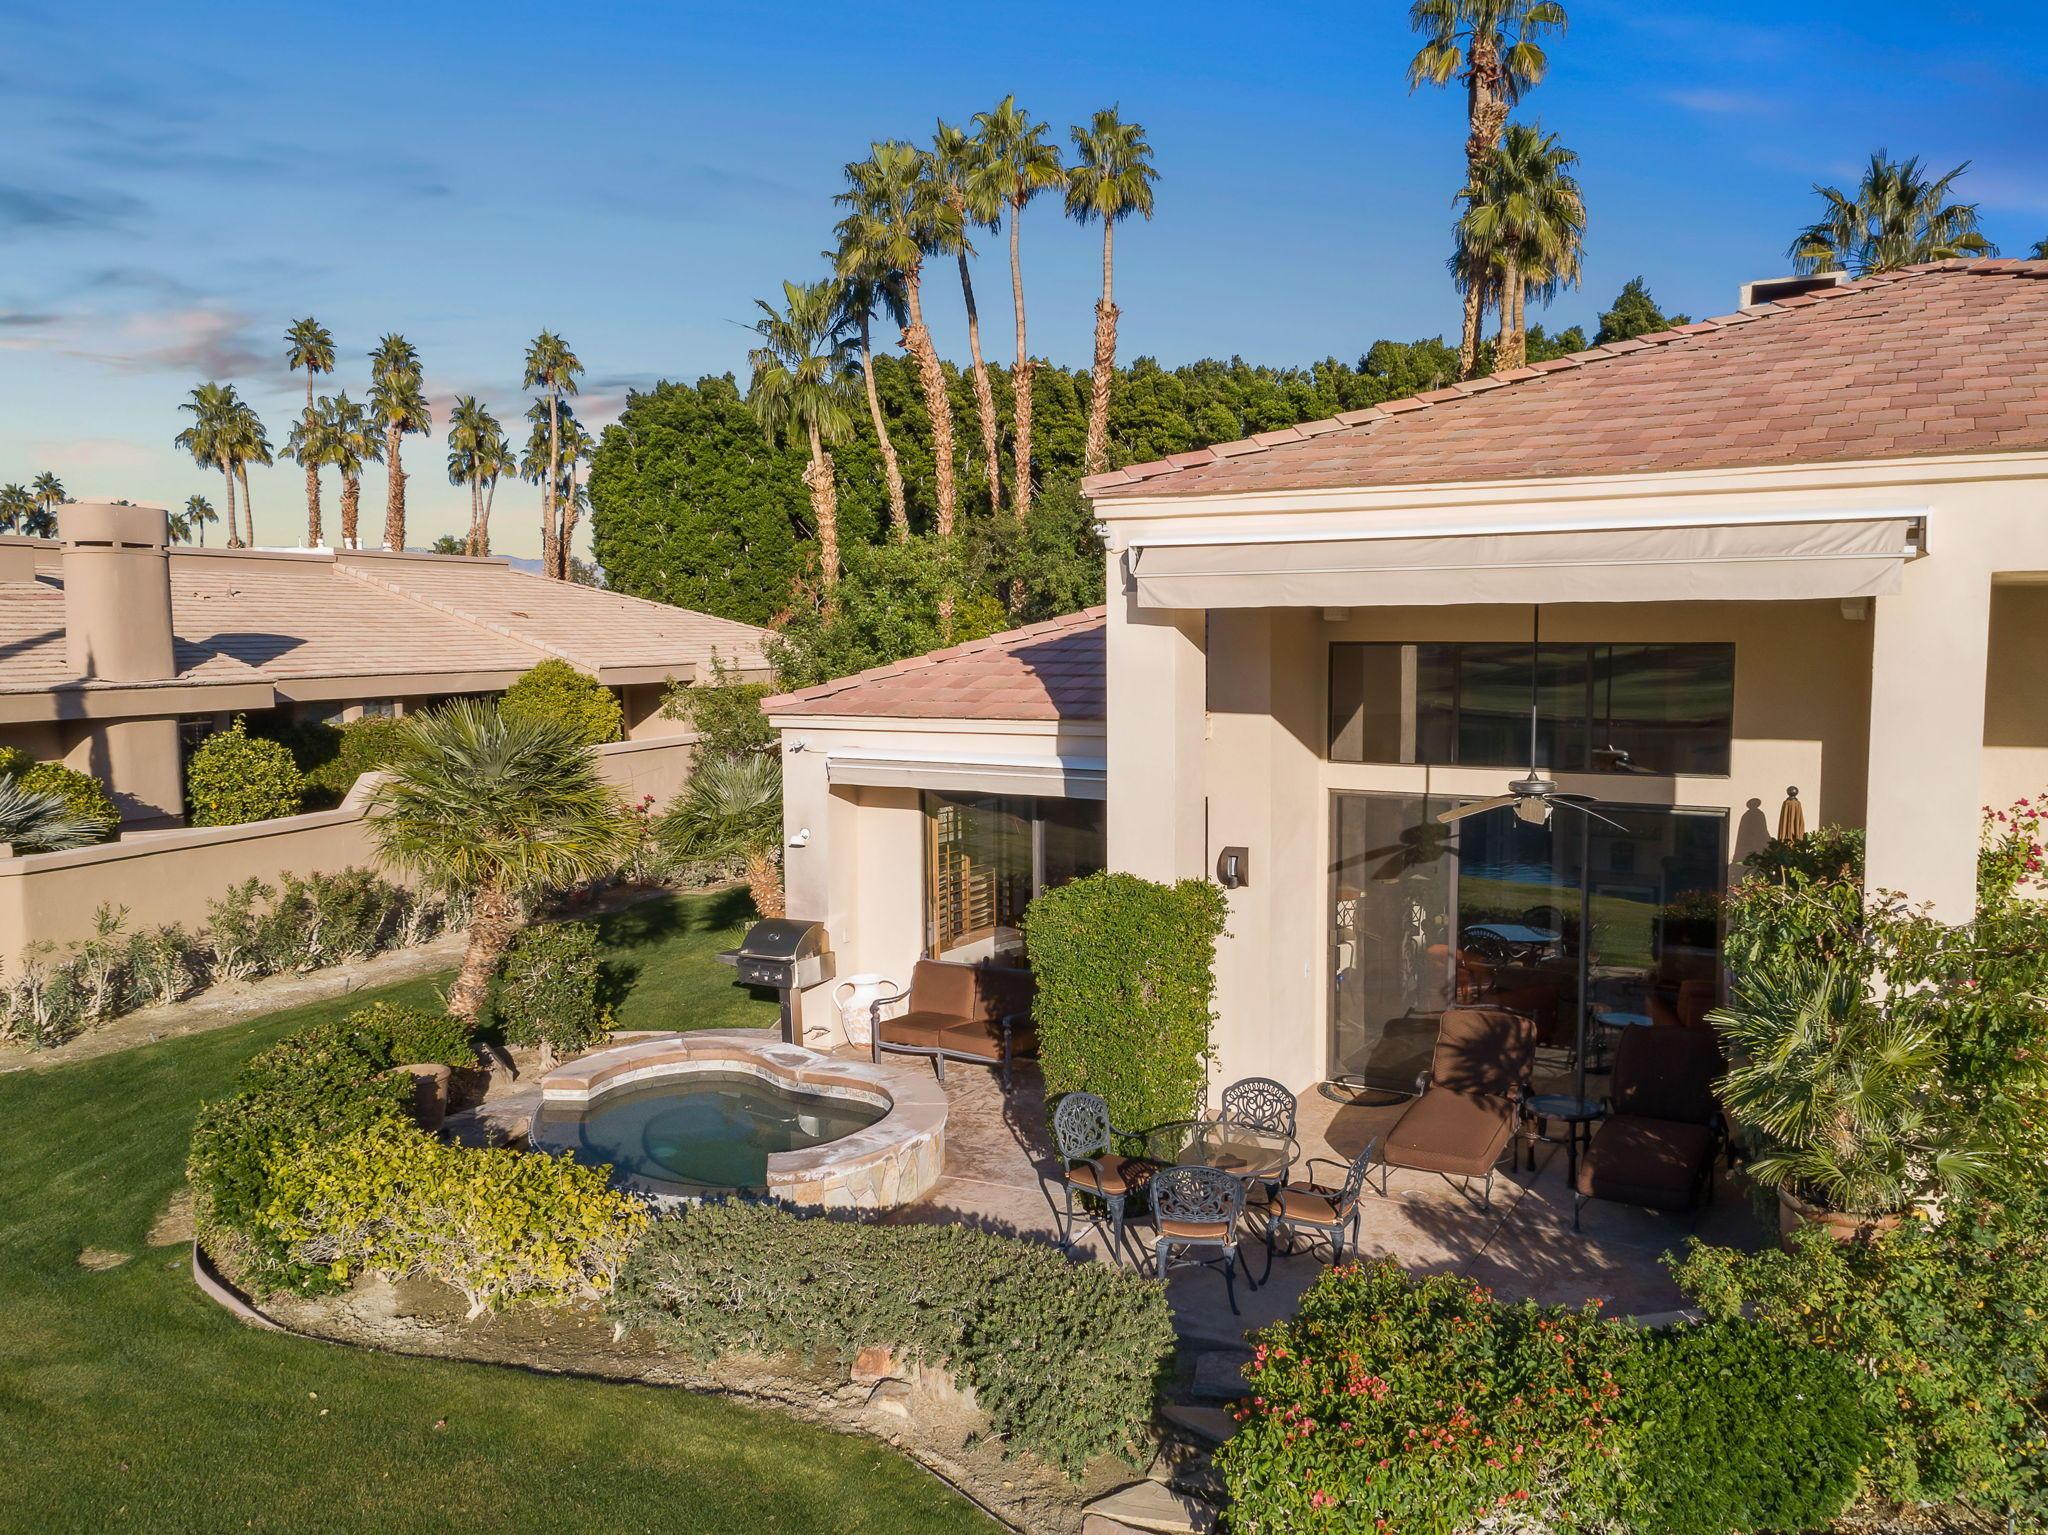 55729 Oakhill, La Quinta, California 92253, 3 Bedrooms Bedrooms, ,3 BathroomsBathrooms,Residential,For Sale,55729 Oakhill,219037630